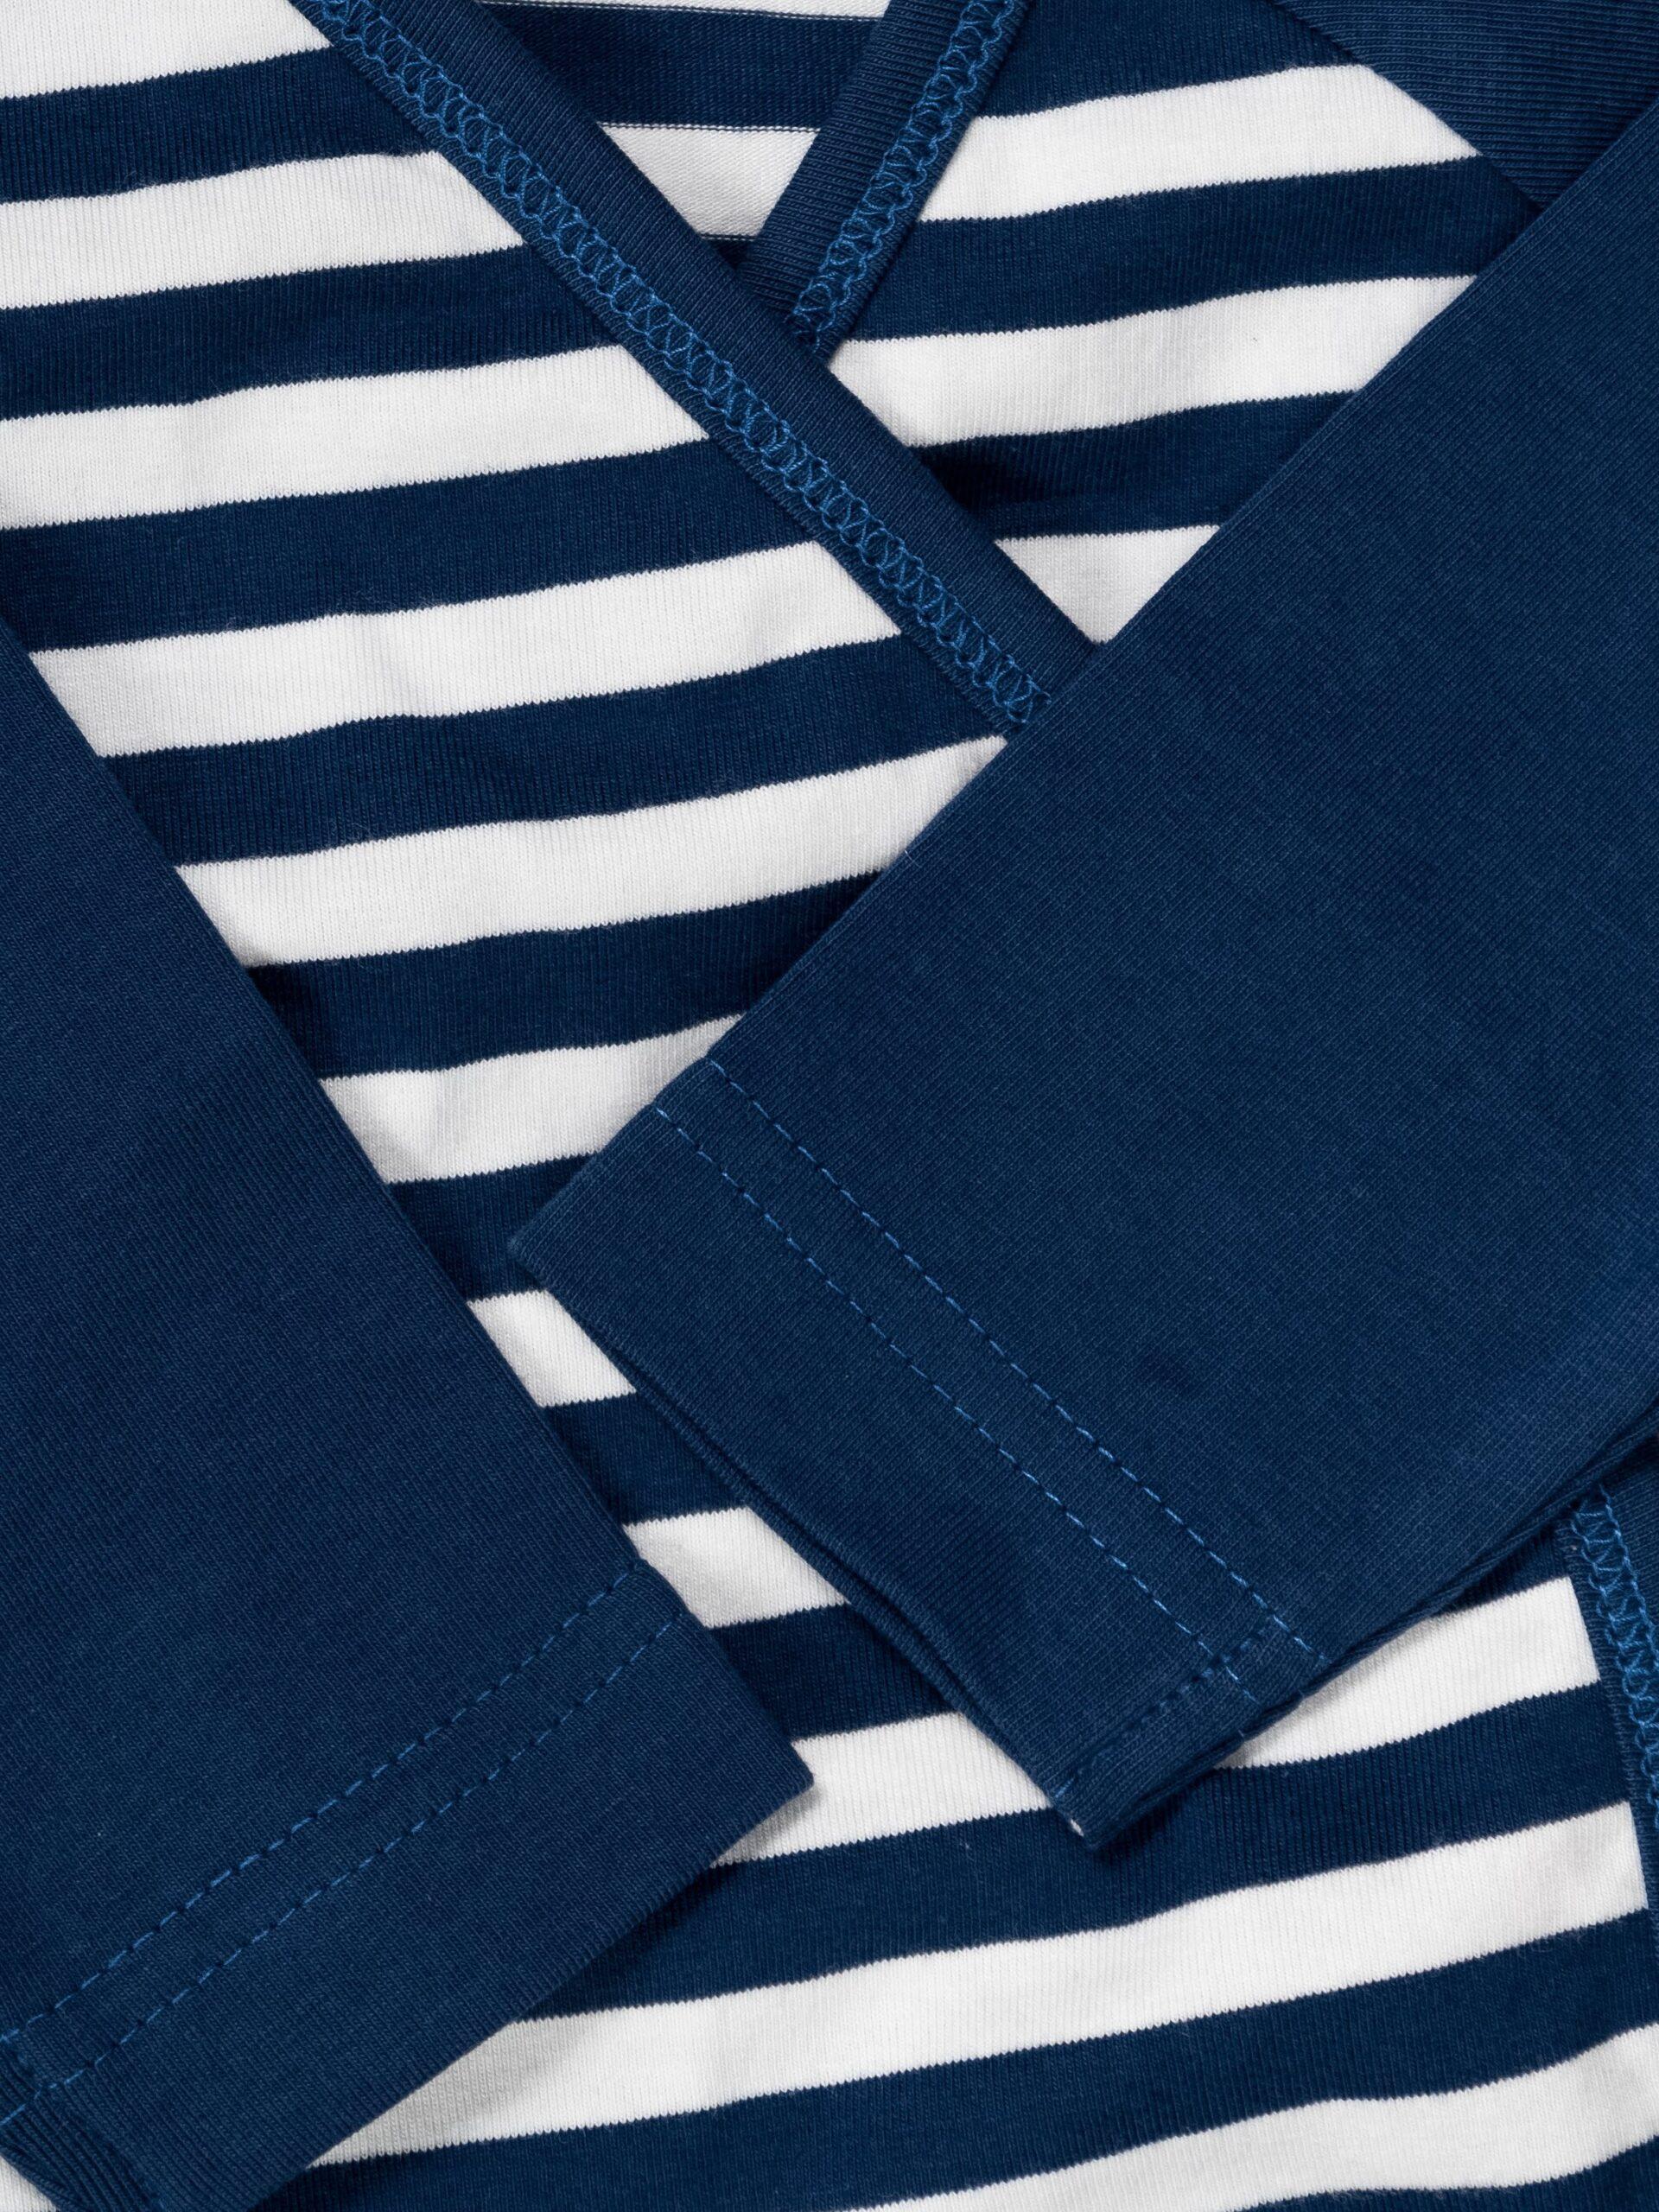 b.warm. Long-sleeved baby bodysuit made of 100% organic cotton